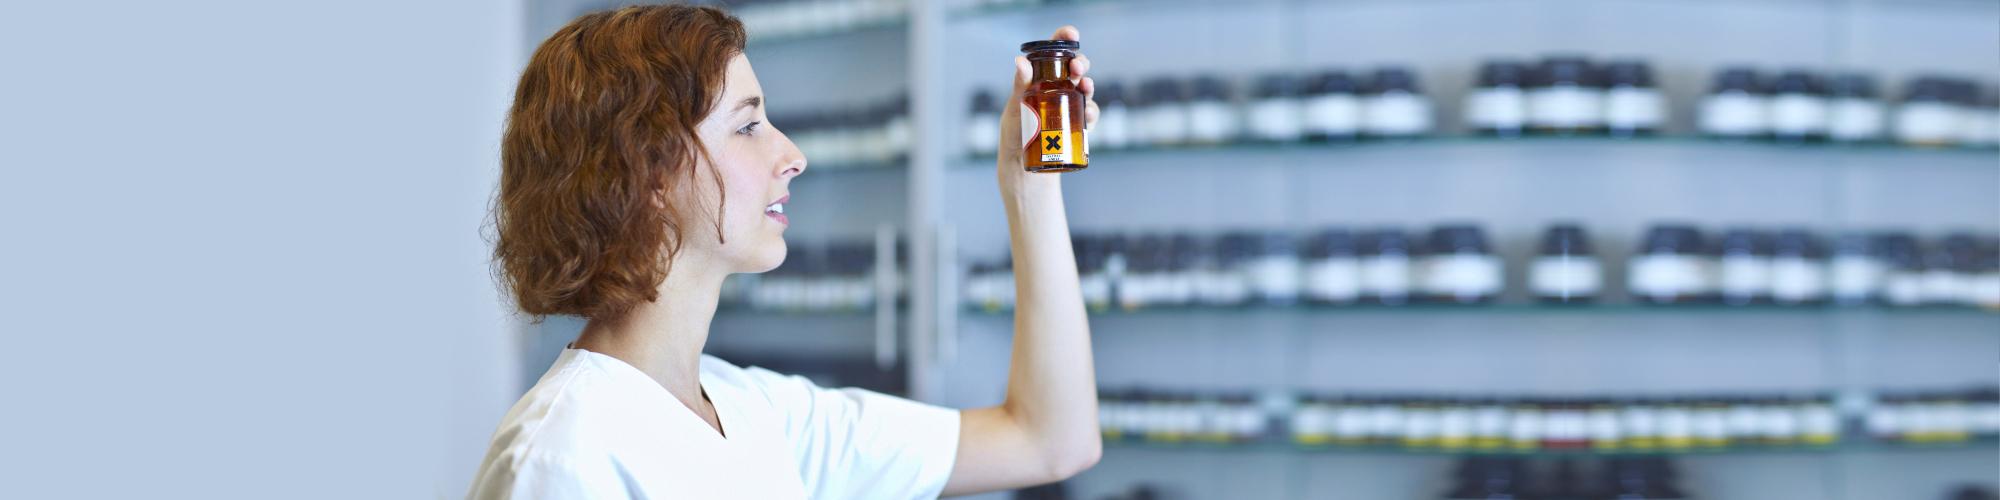 pharmacist checking